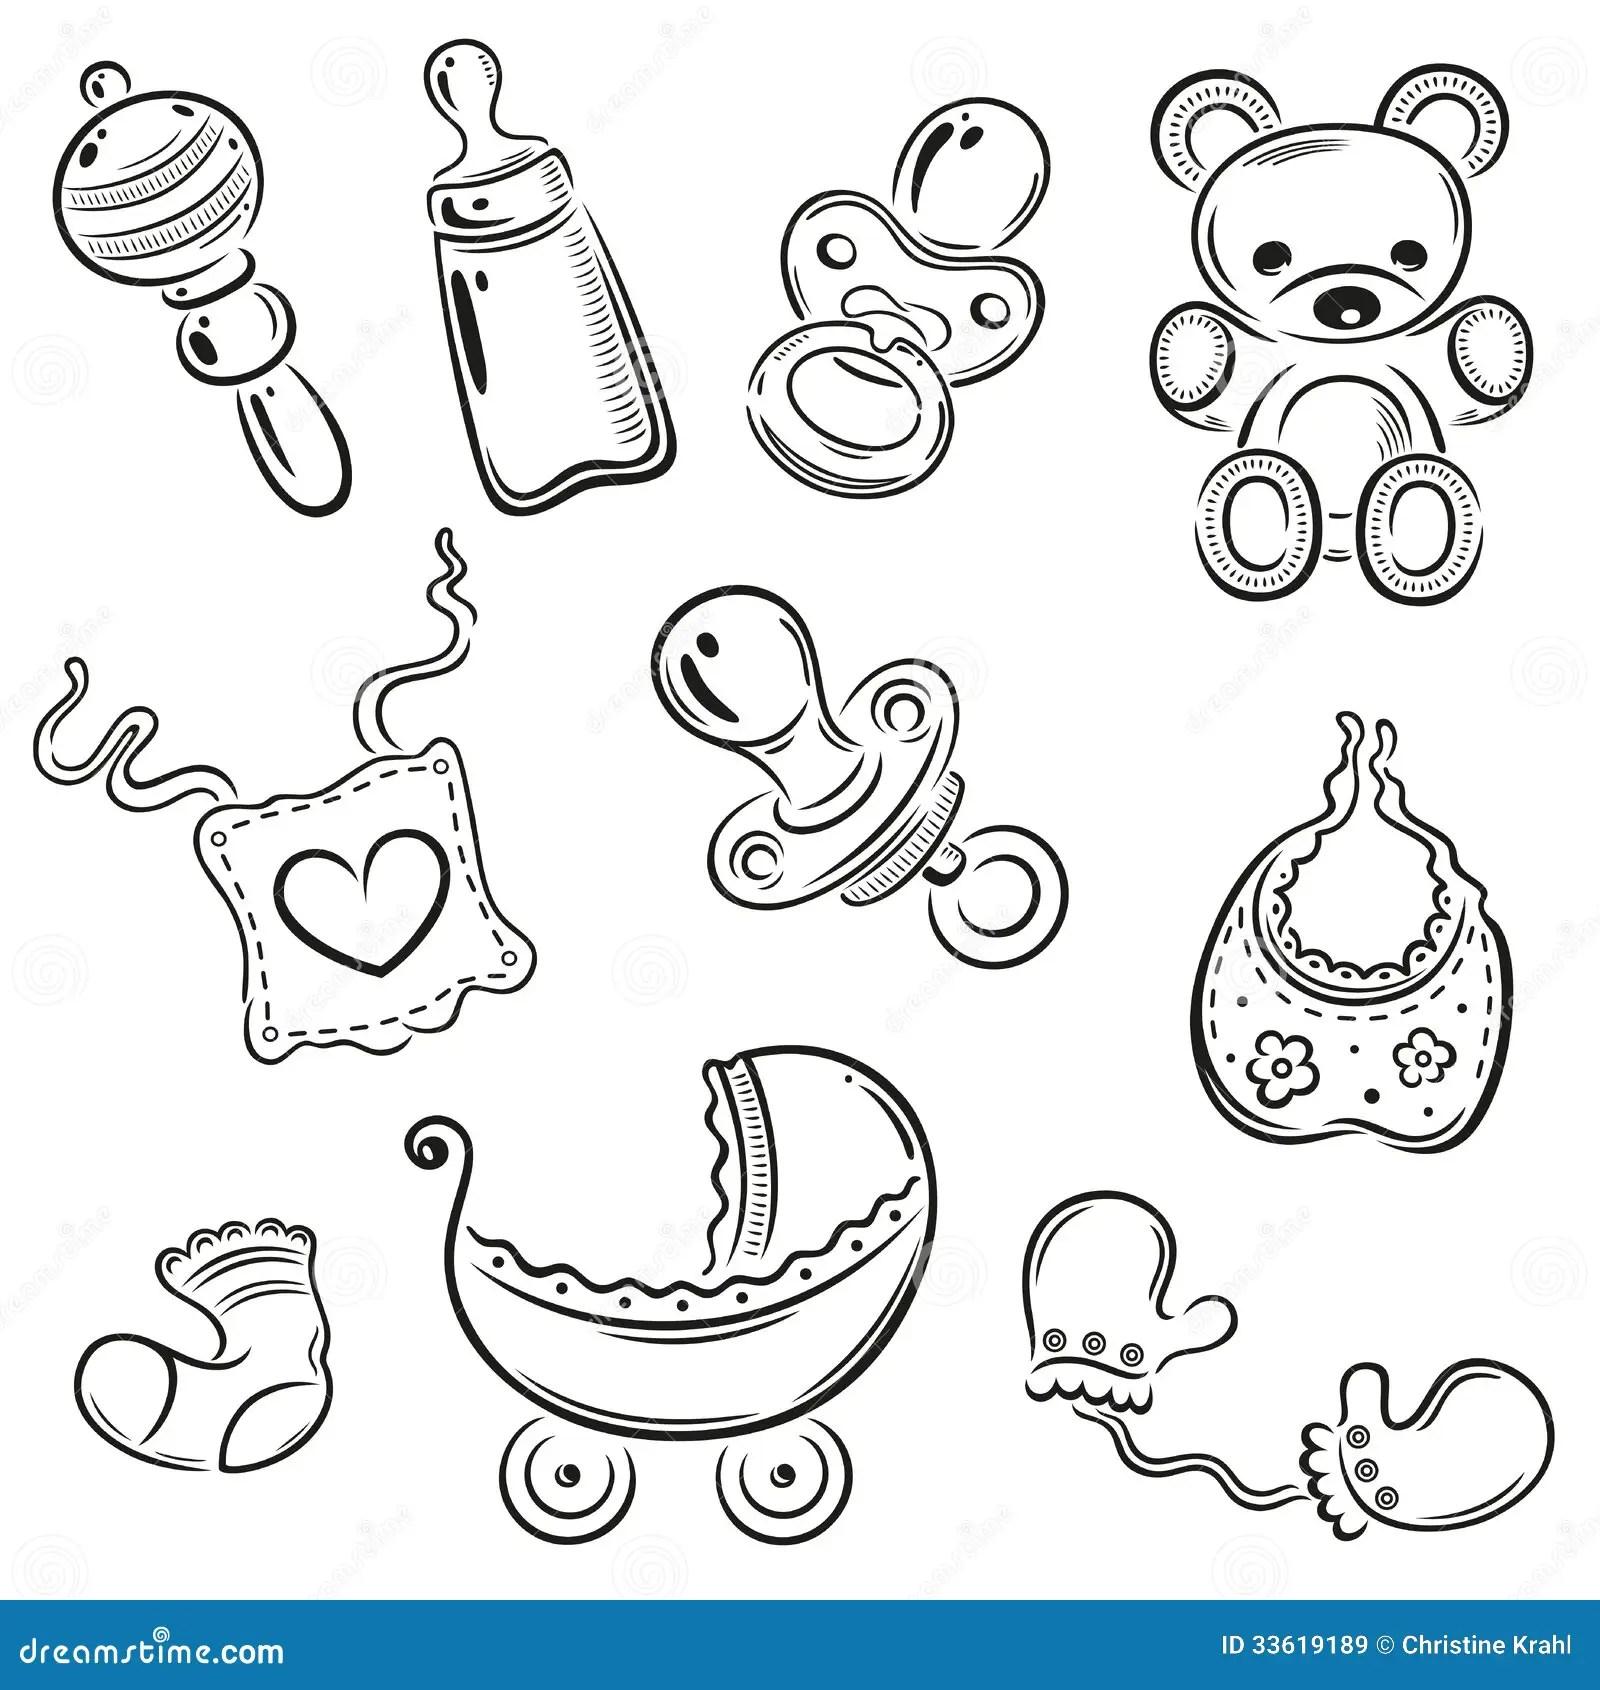 Baby Children Vector Stock Vector Illustration Of